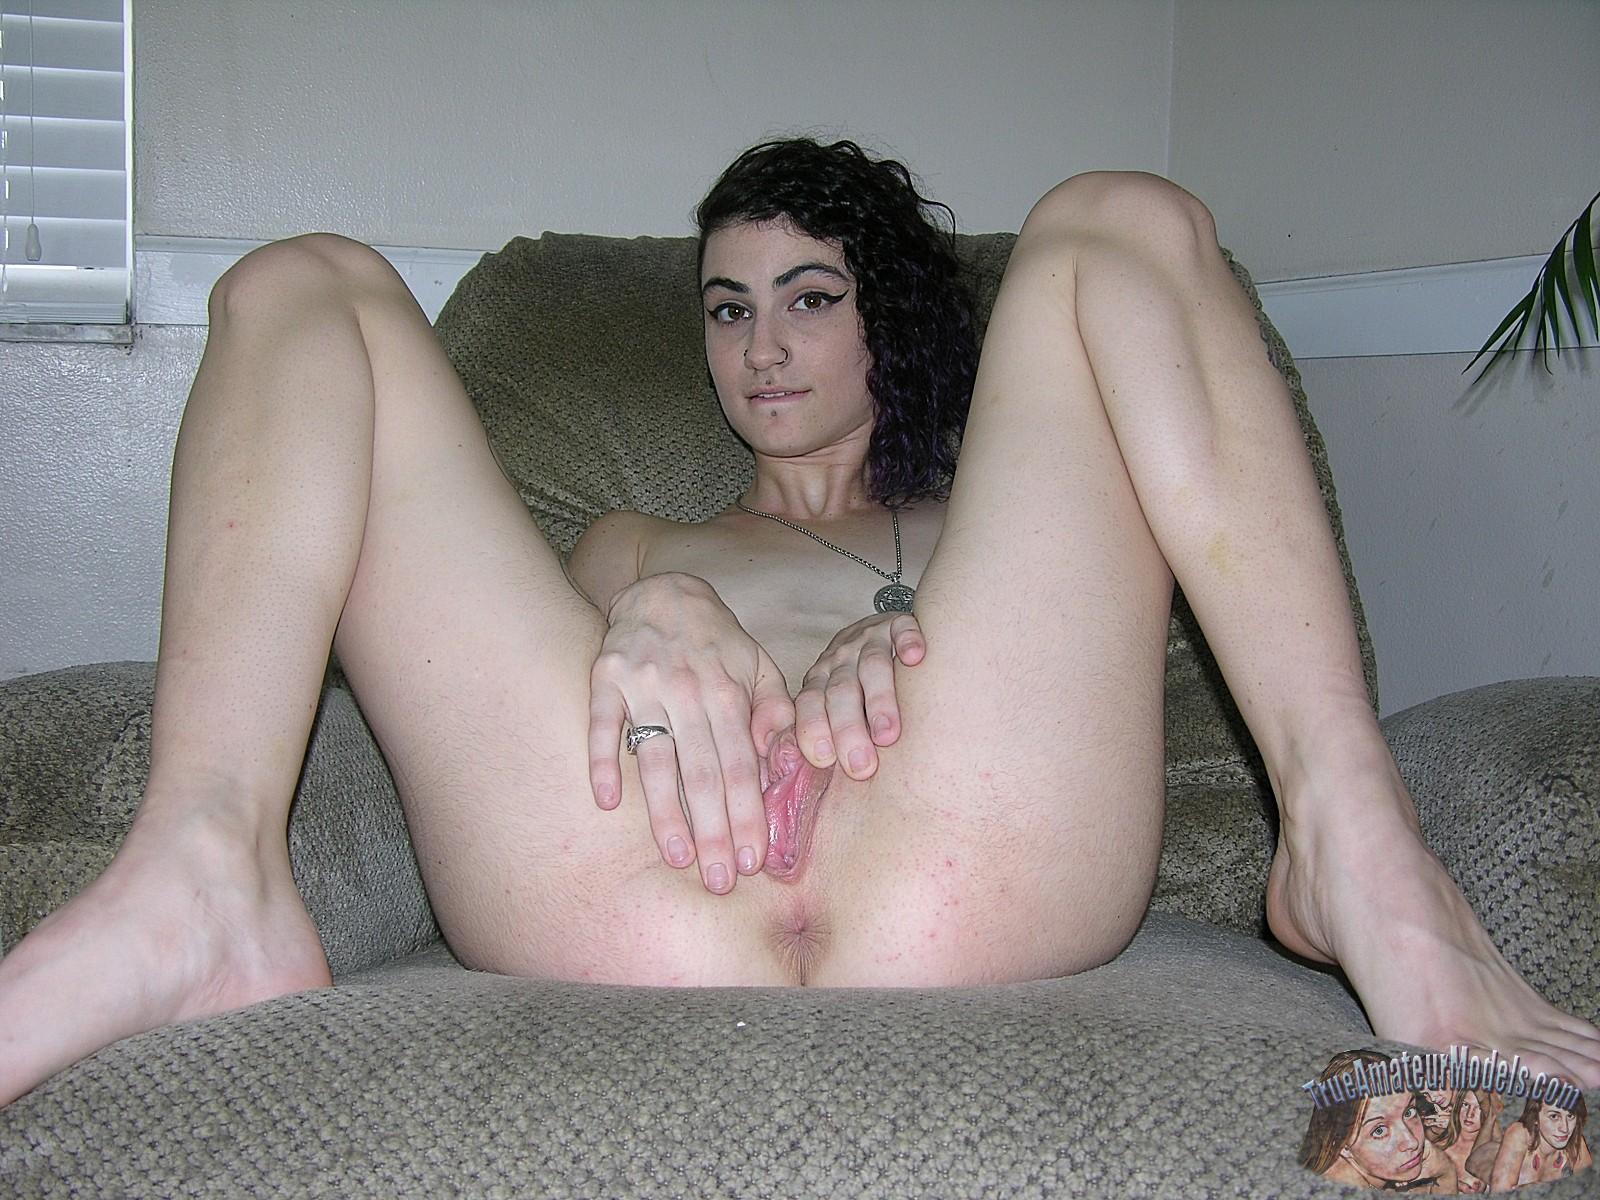 Punk rock pussy nude